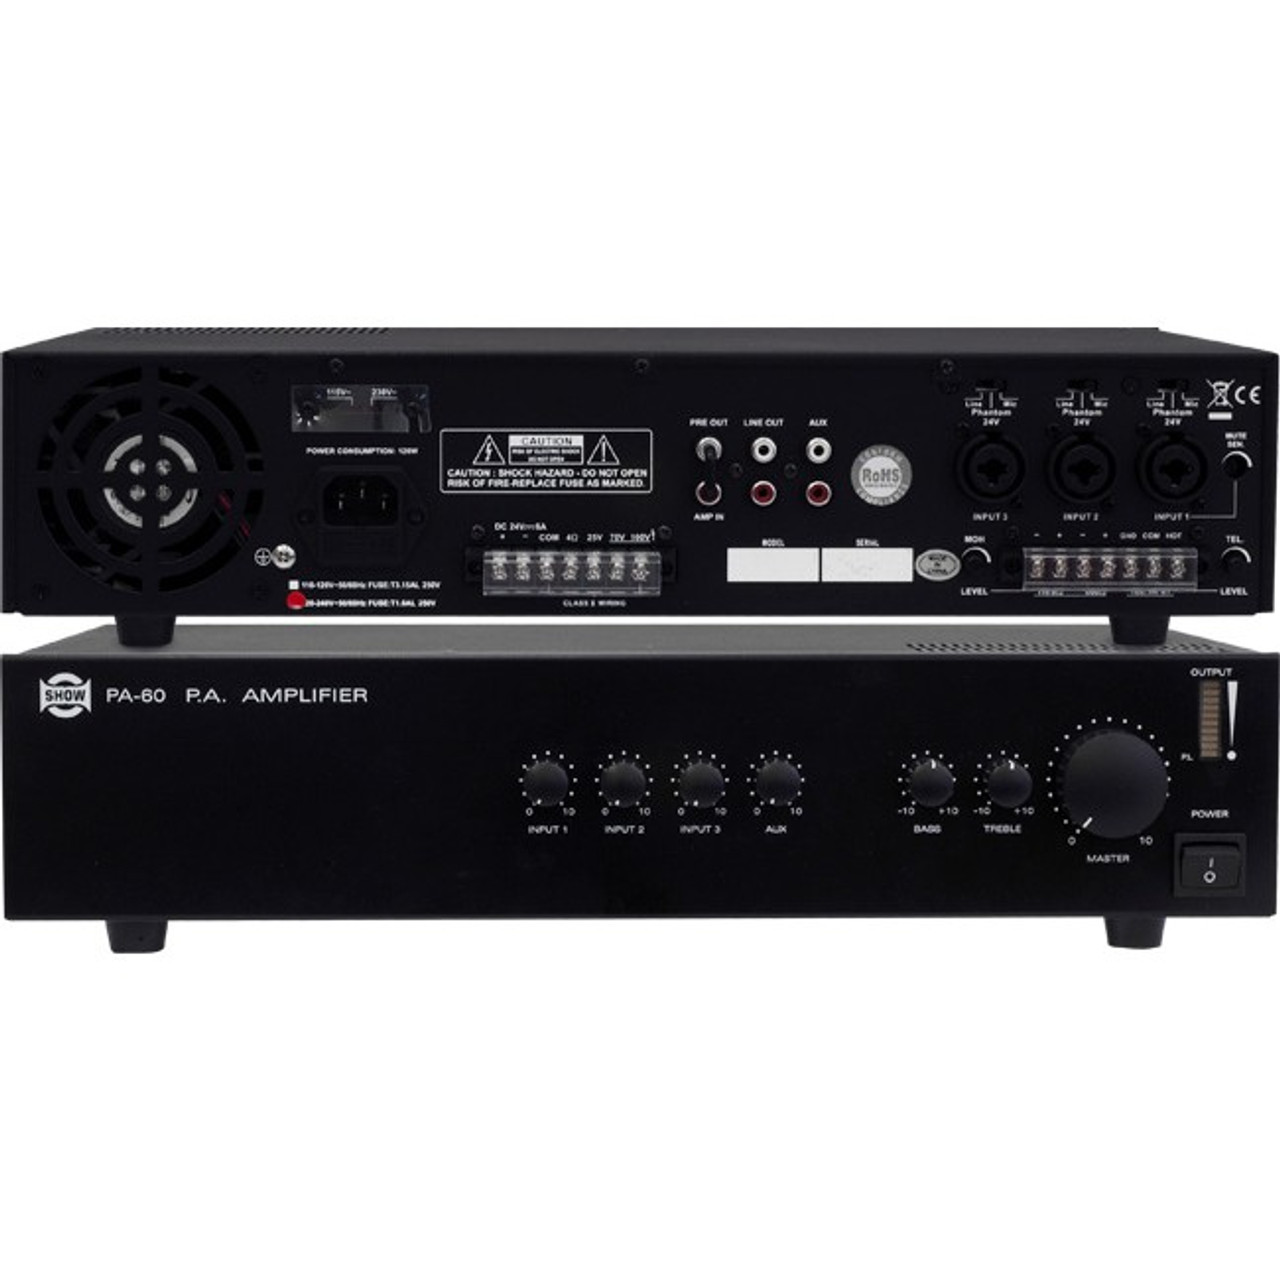 SHOW PA60 60W High Performance Professional Multiplex Amplifier - Black